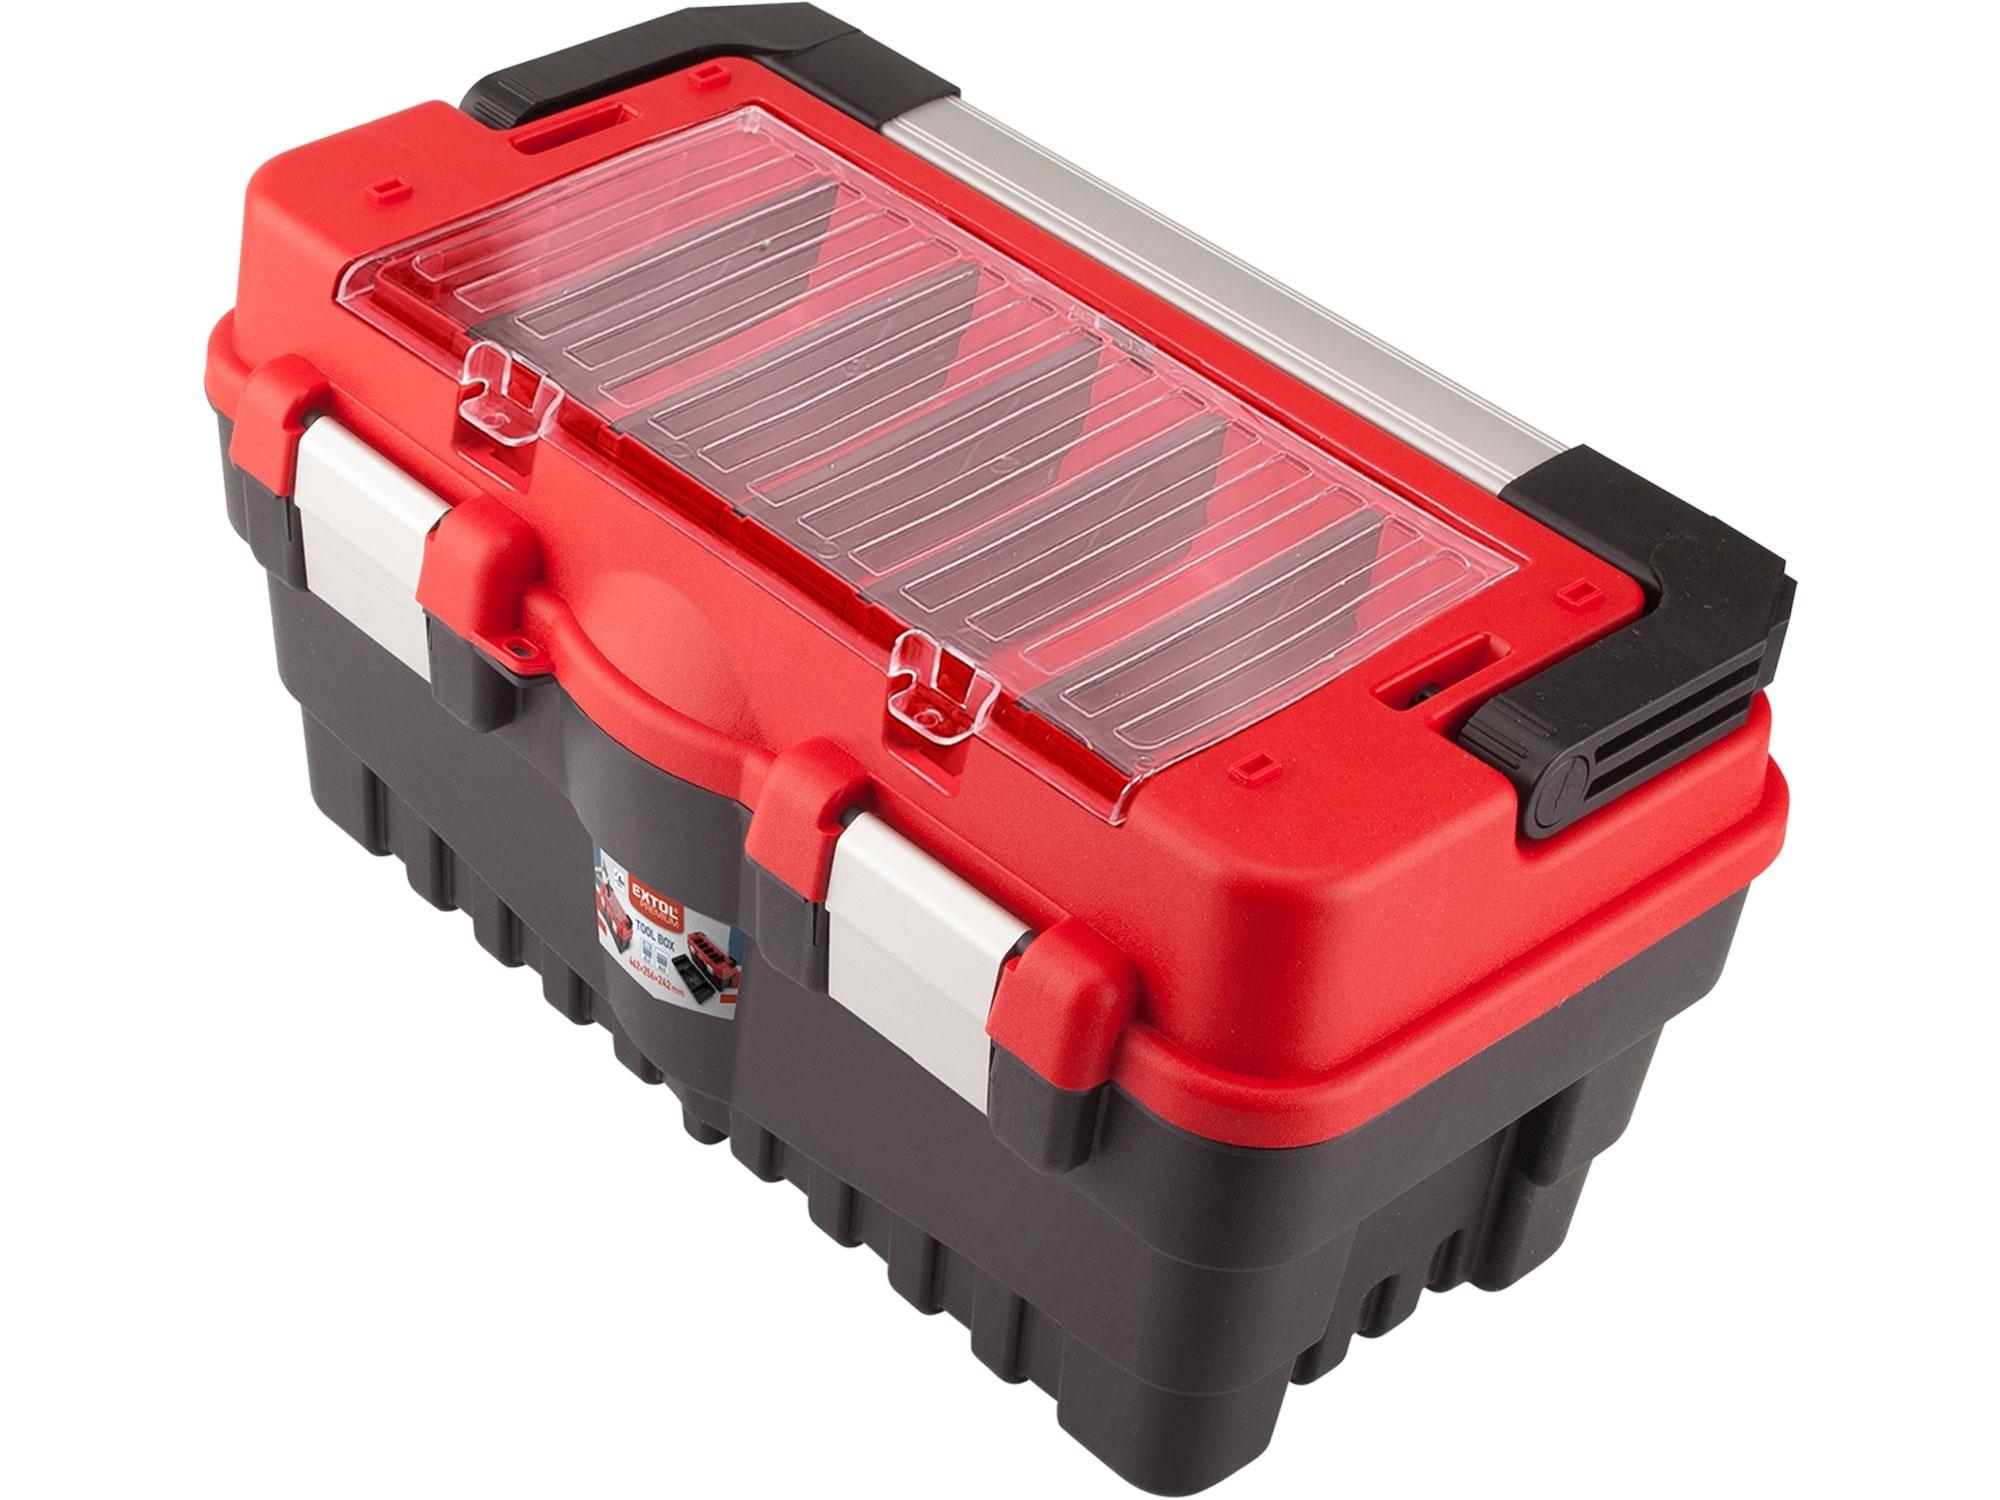 kufr na nářadí CARBO vel. S, 462x256x242mm, EXTOL PREMIUM 8856080